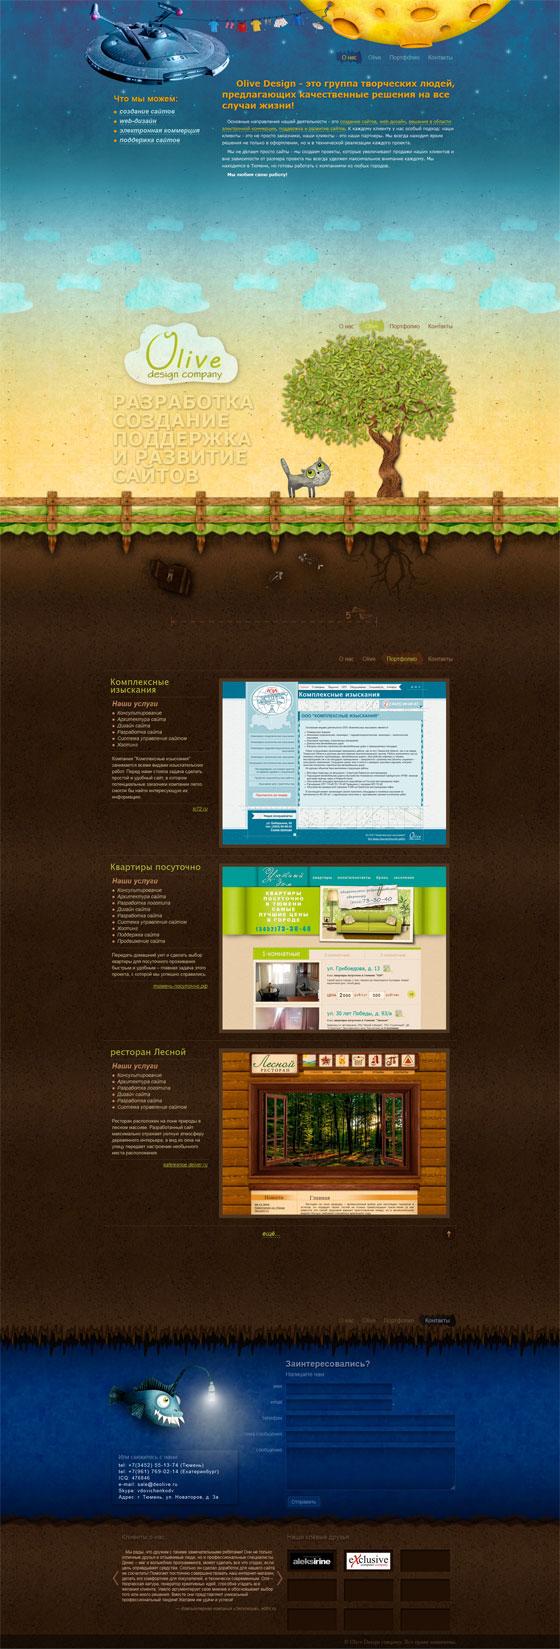 Olive Design Company | Web Designer